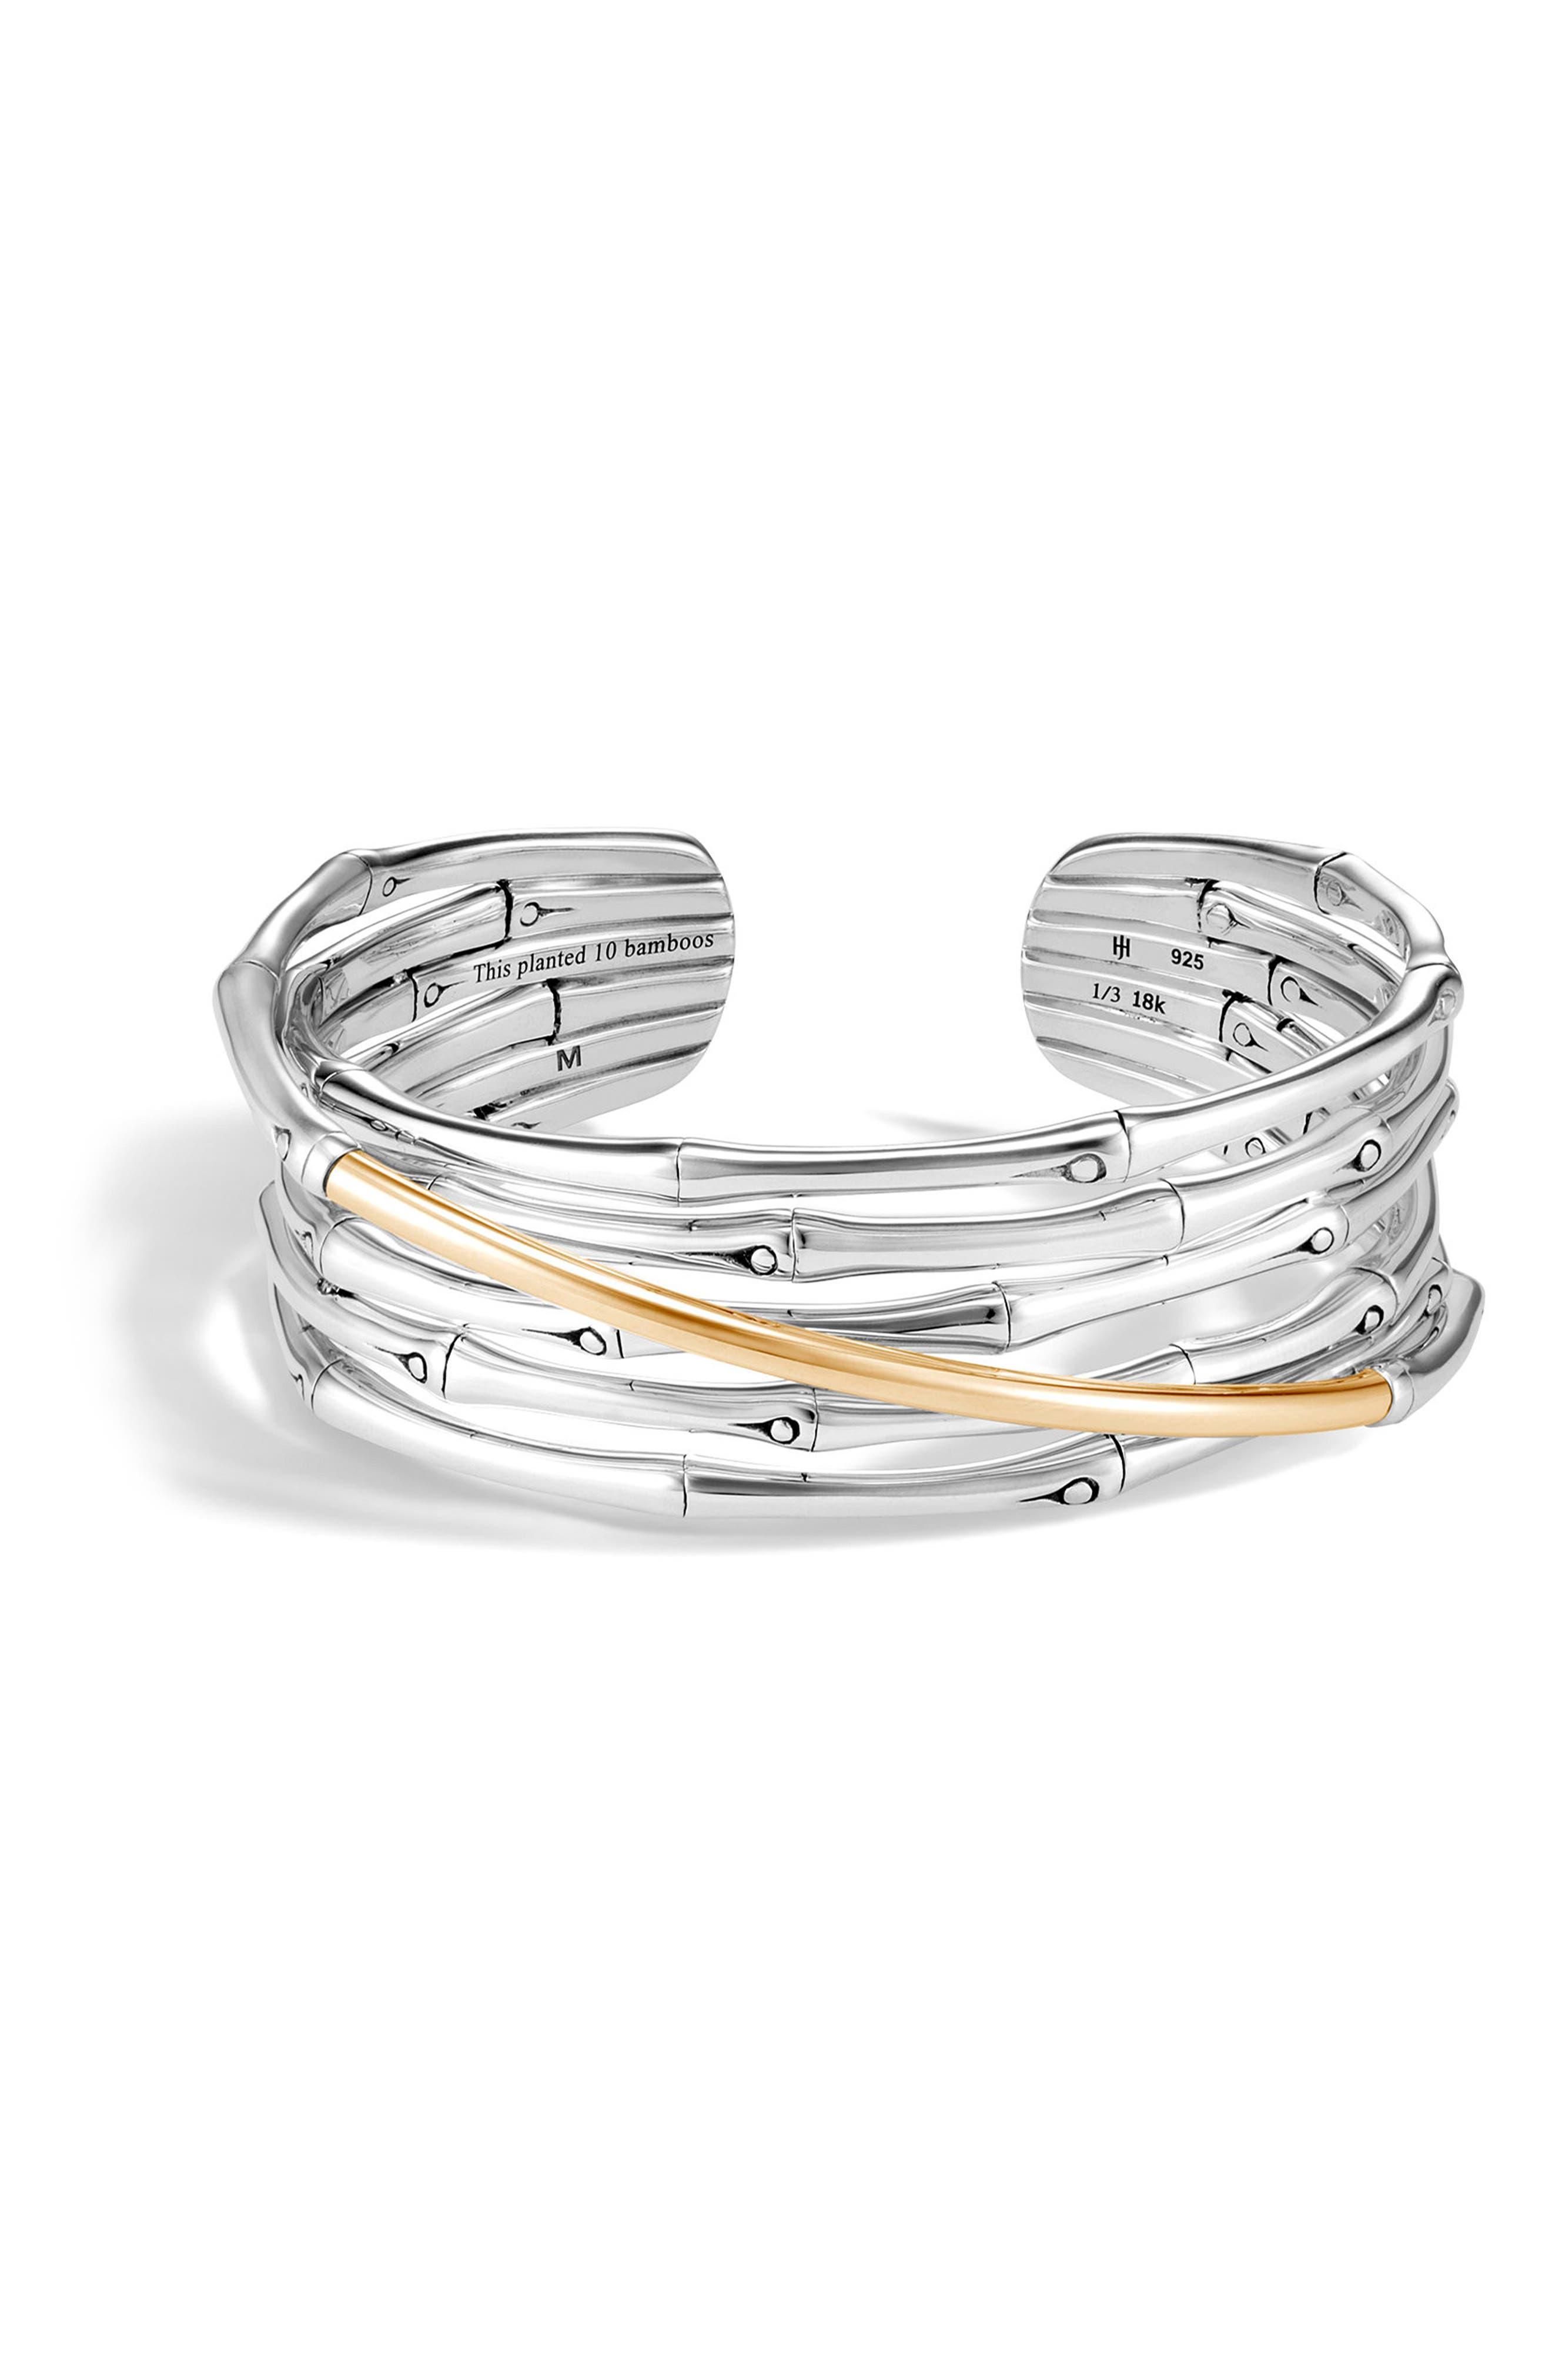 Bamboo 18K Gold & Silver Flex Cuff Bracelet,                         Main,                         color, Silver/ Gold